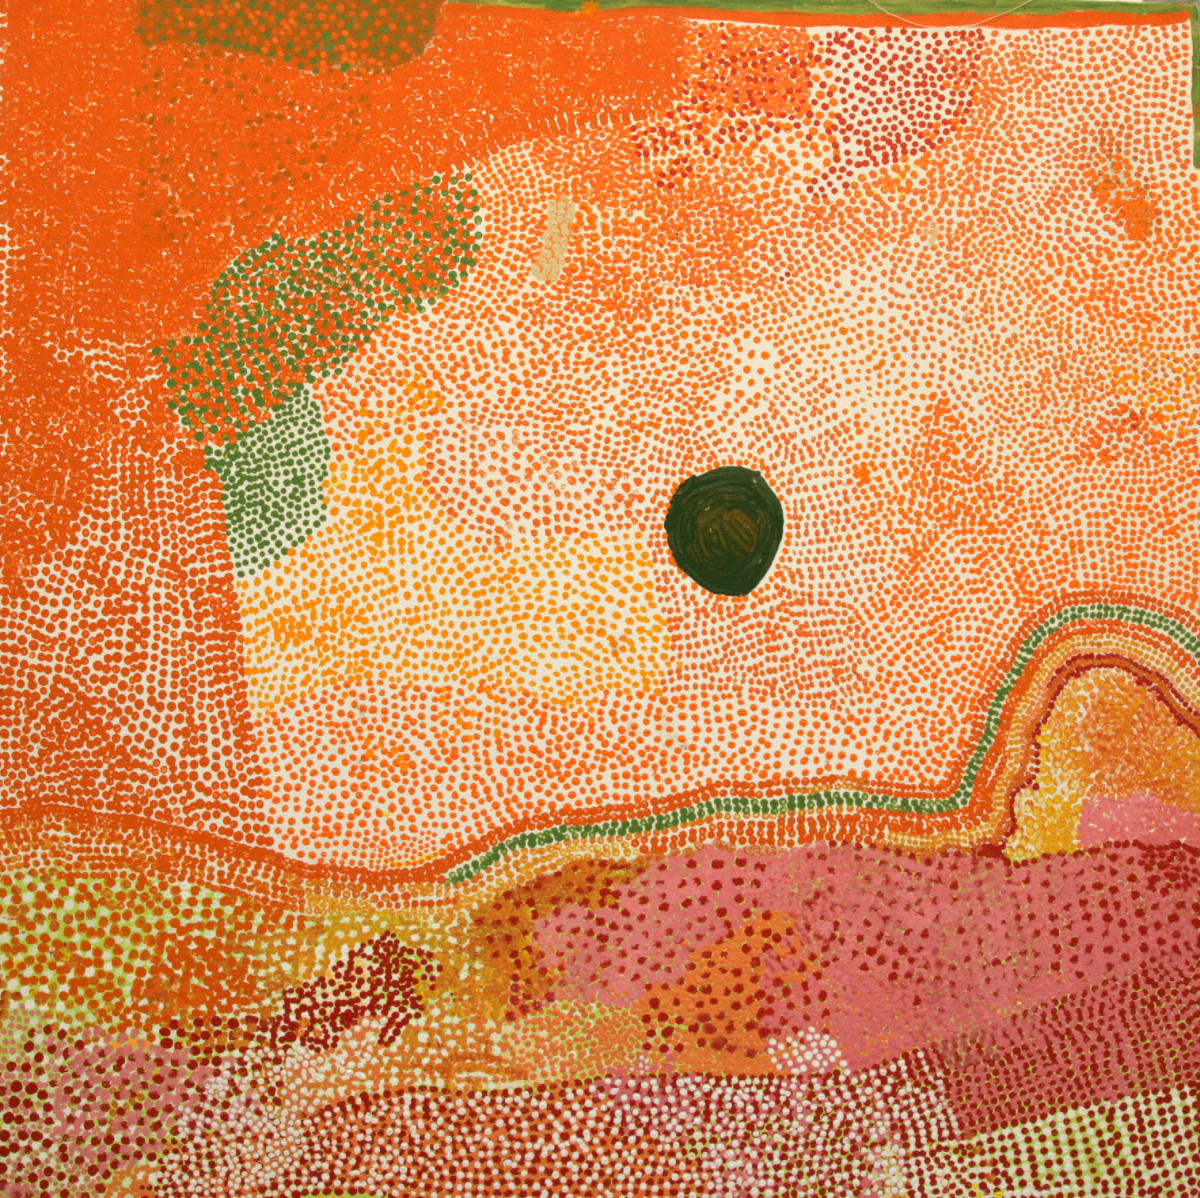 Rosie Goodjie Nyimi acrylic on canvas 120 x 120 cm